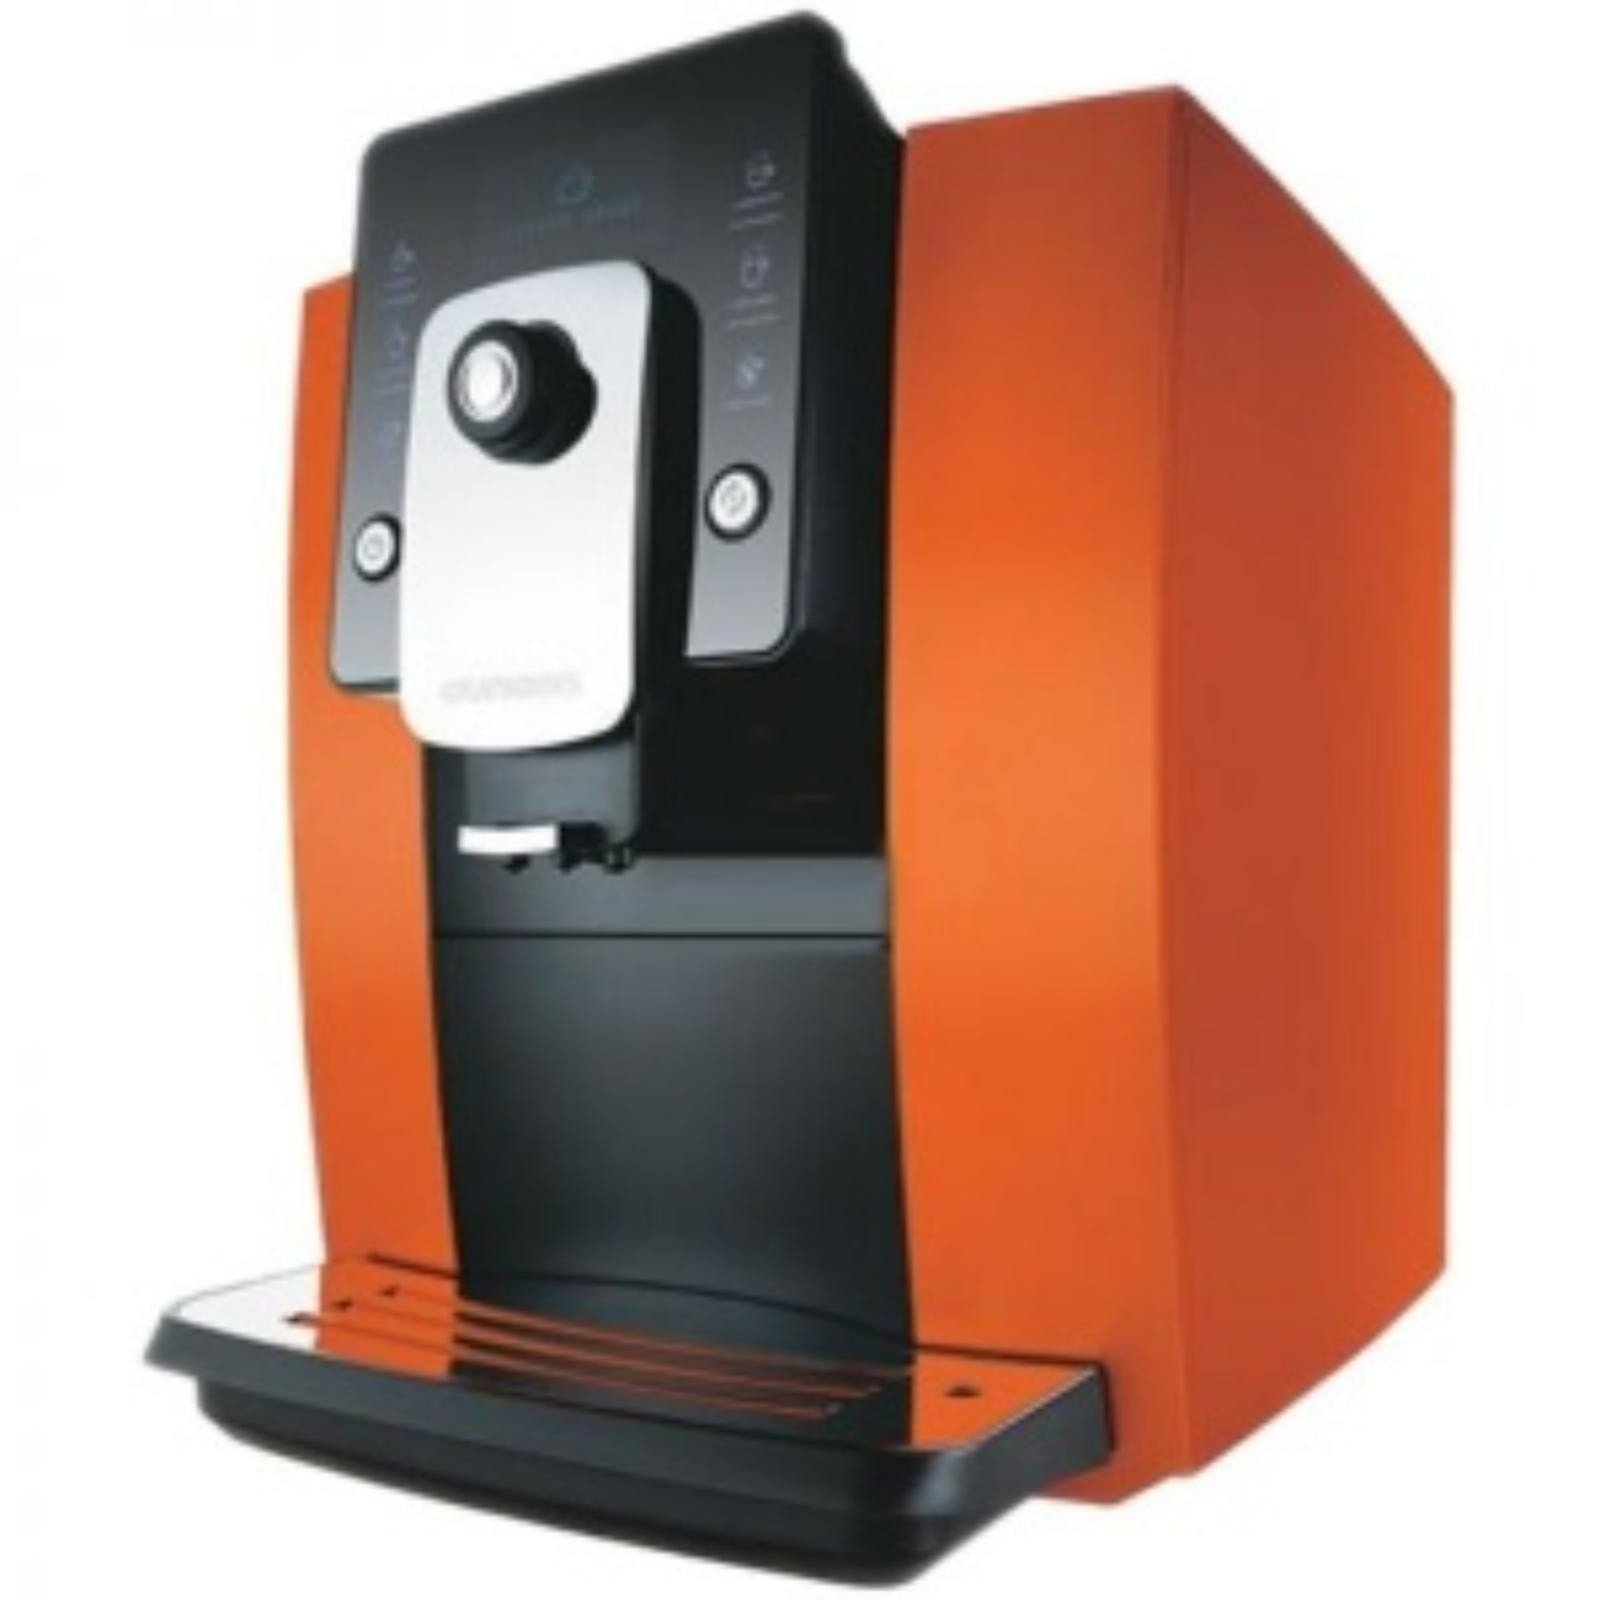 Espressor automat Oursson AM6244/OR, 1200 W, 19 bari, 1.8 l, portocaliu